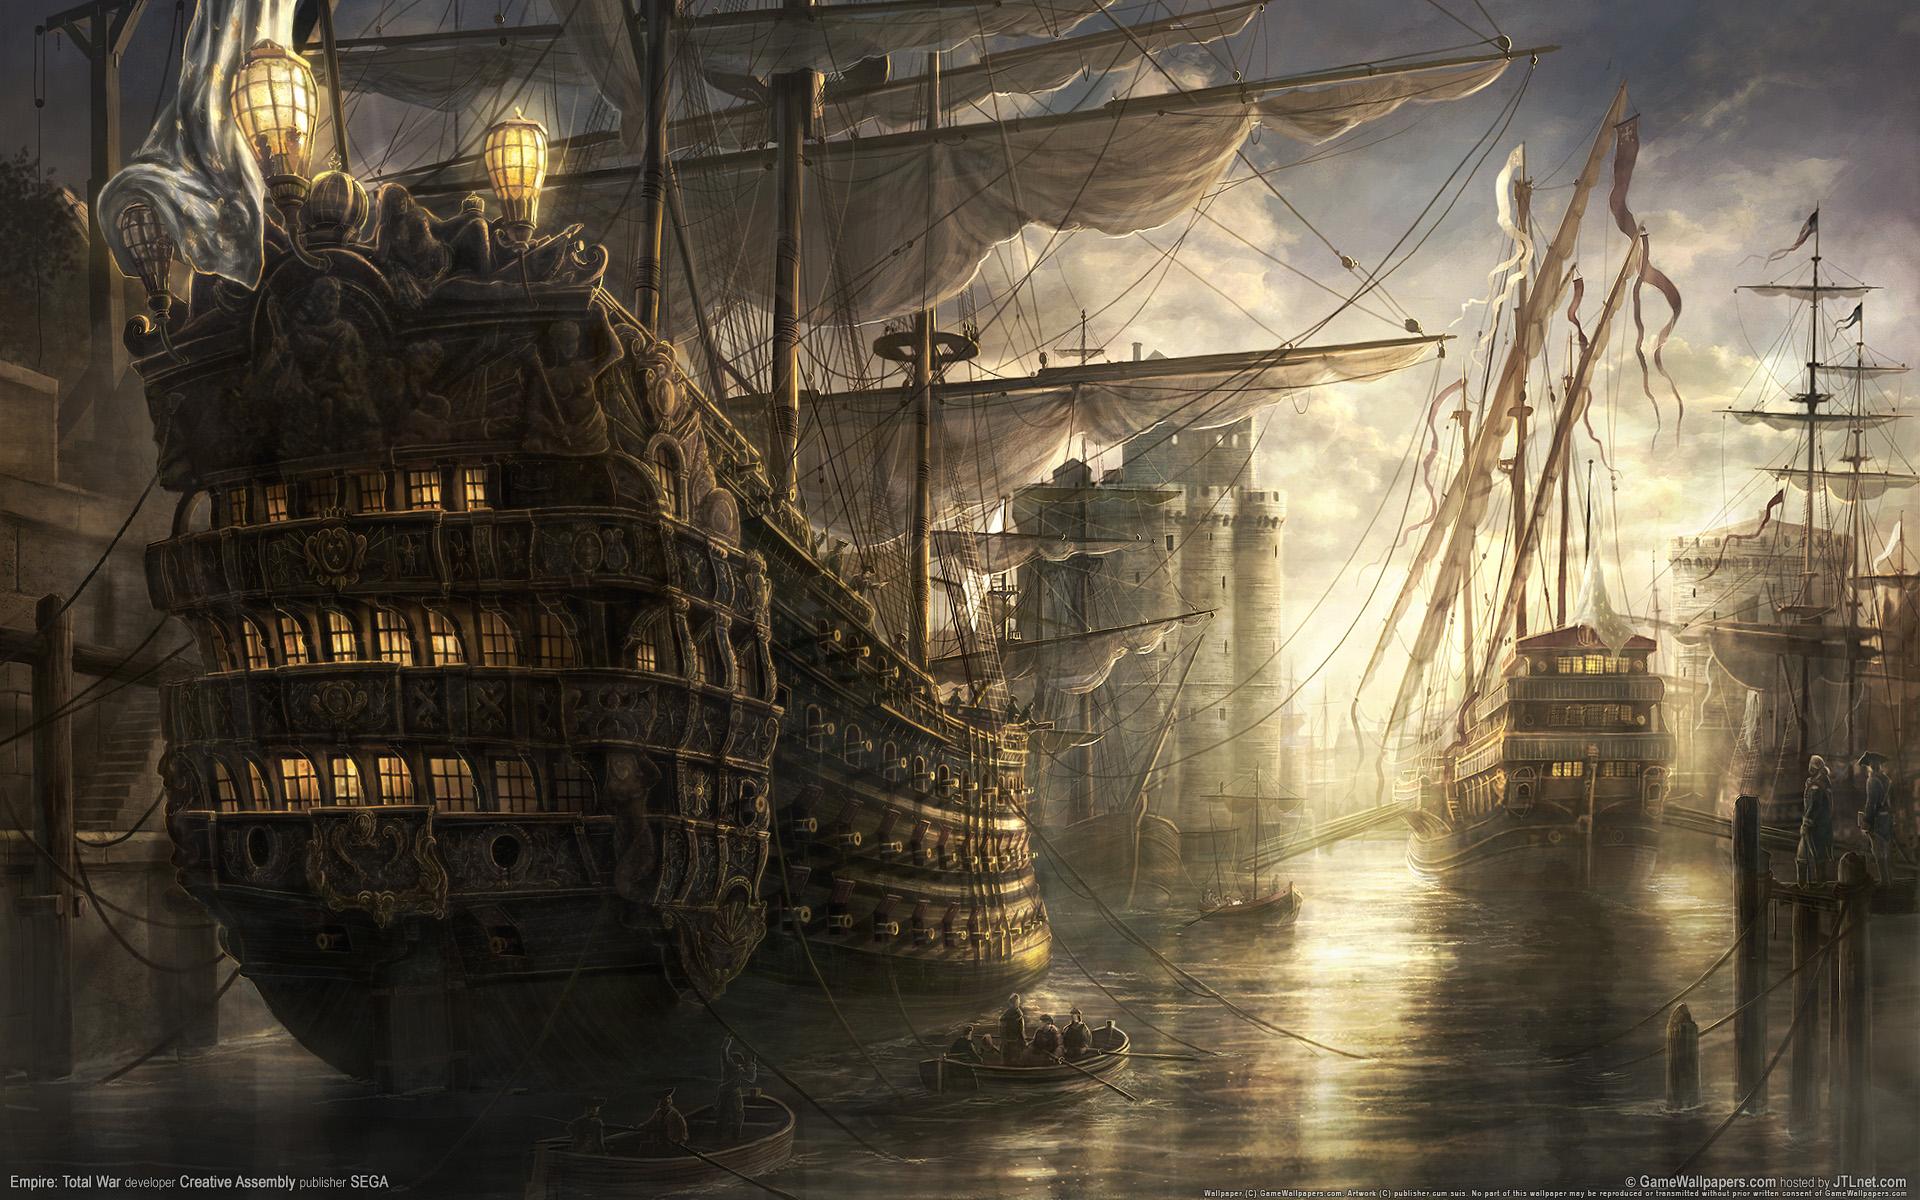 HD Wallpapers Empire Total War 2